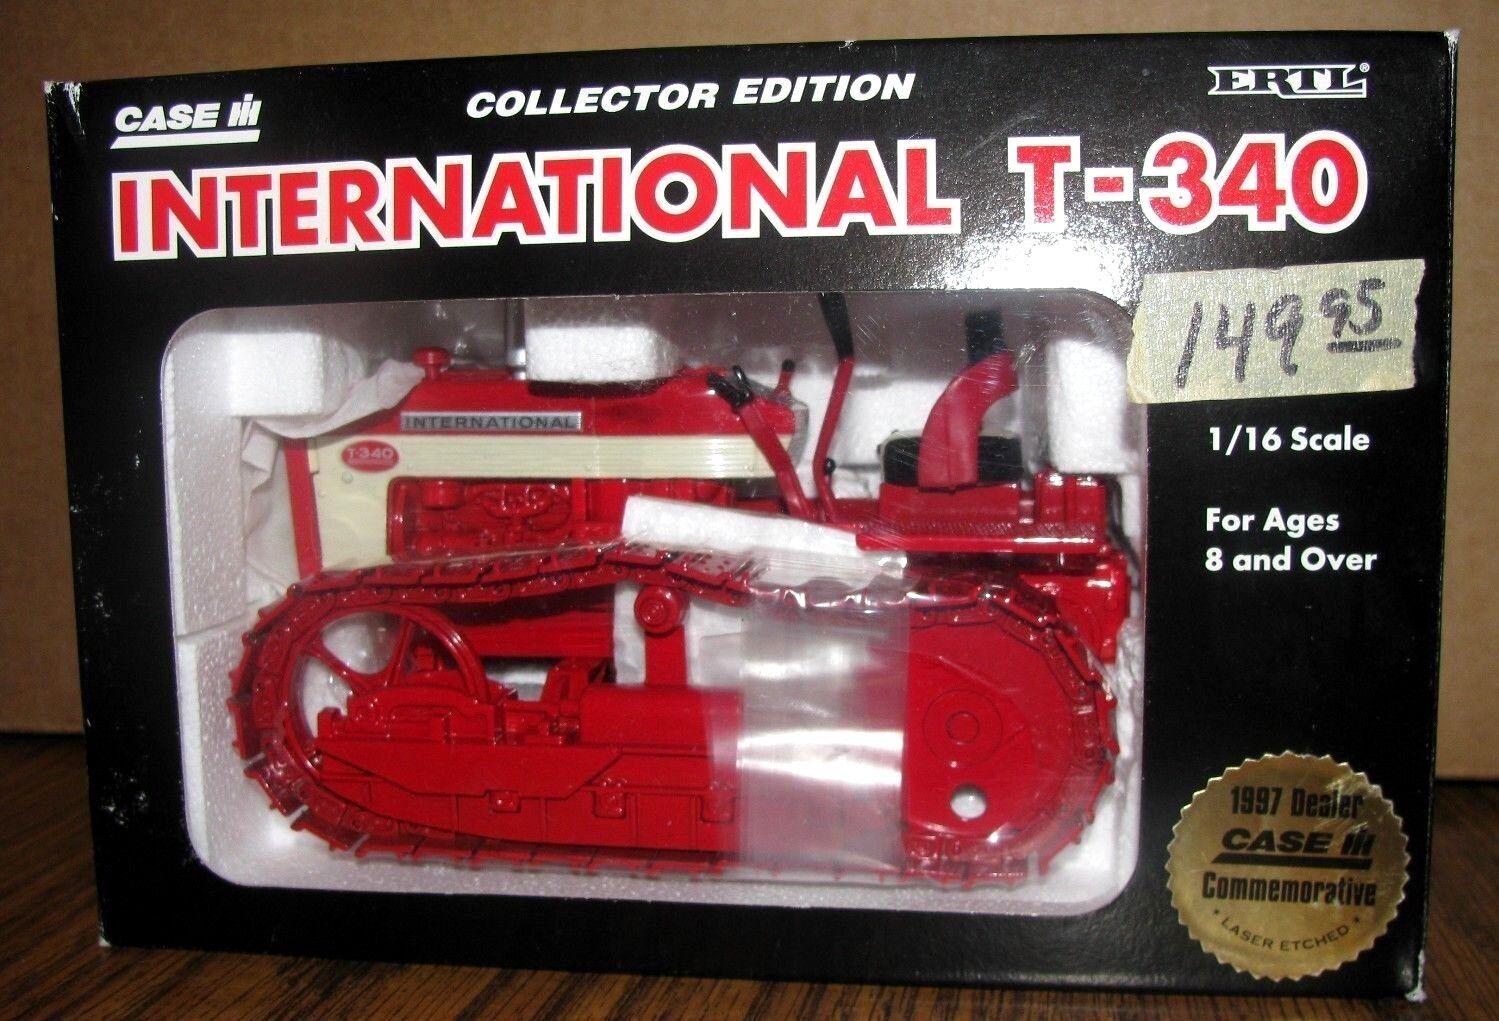 IH International T340 Crawler Tractor 1 16 Ertl Toy 1997 1997 1997 Case DEALER CollectorEd 39ba52